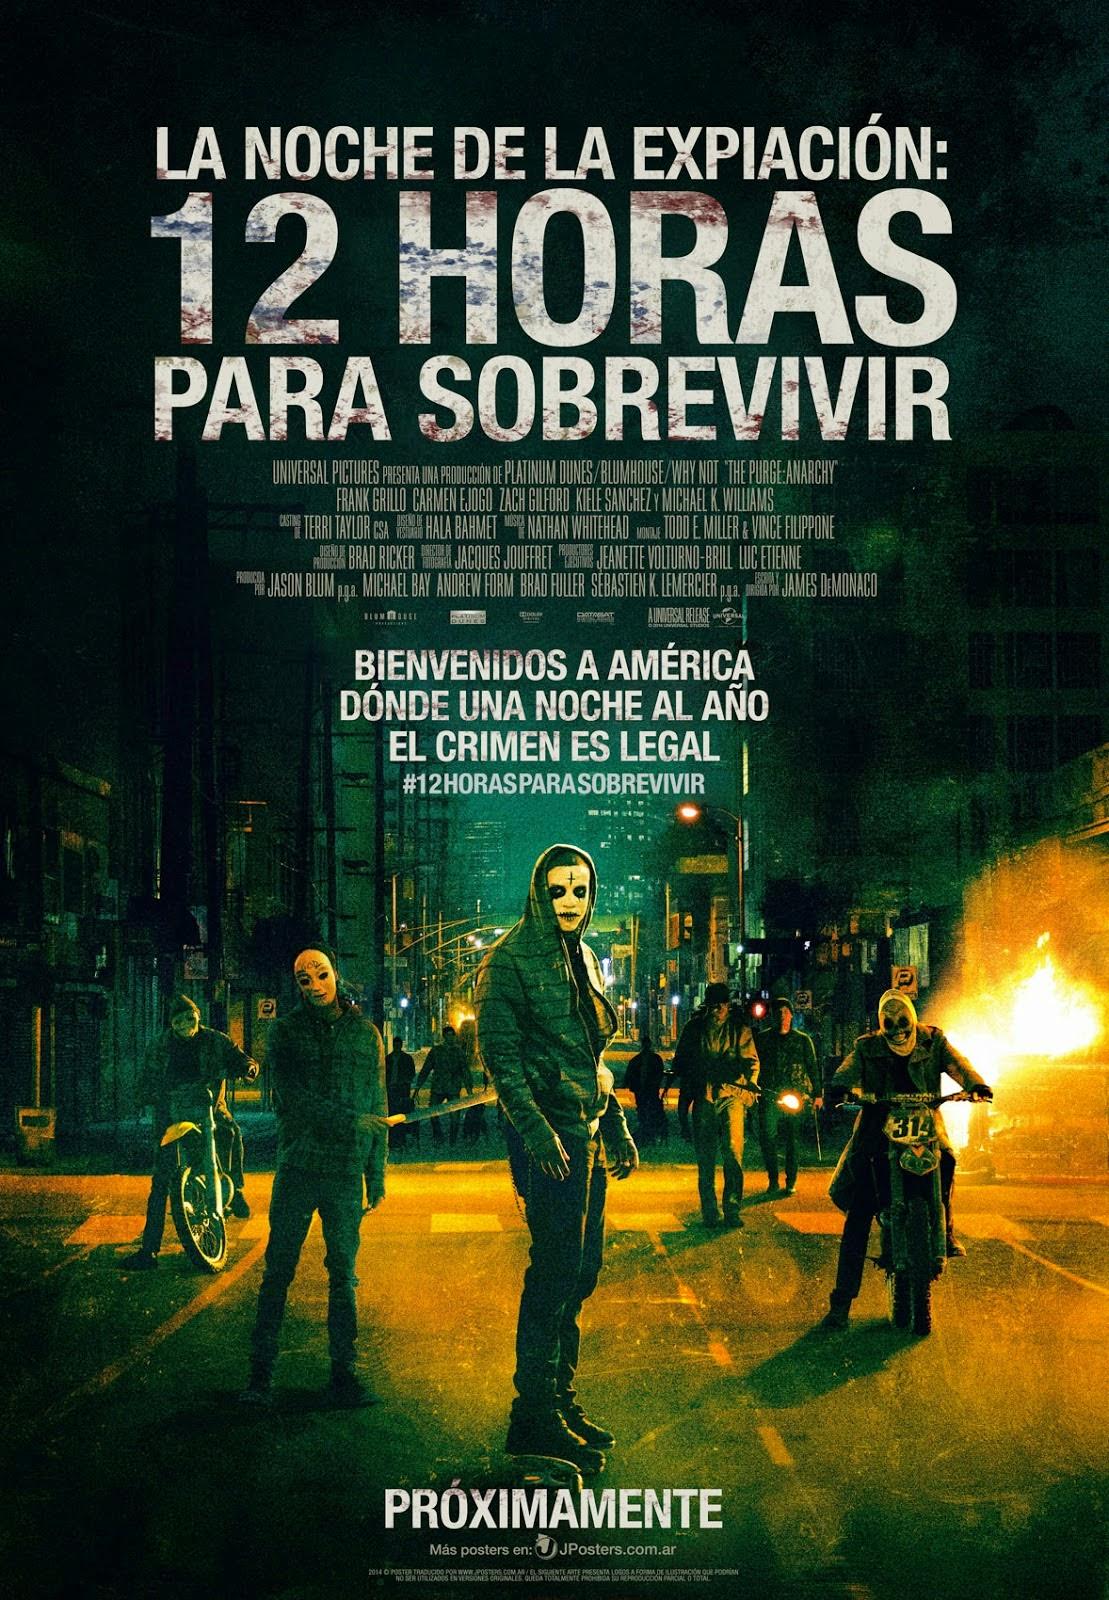 12 horas trailer latino dating